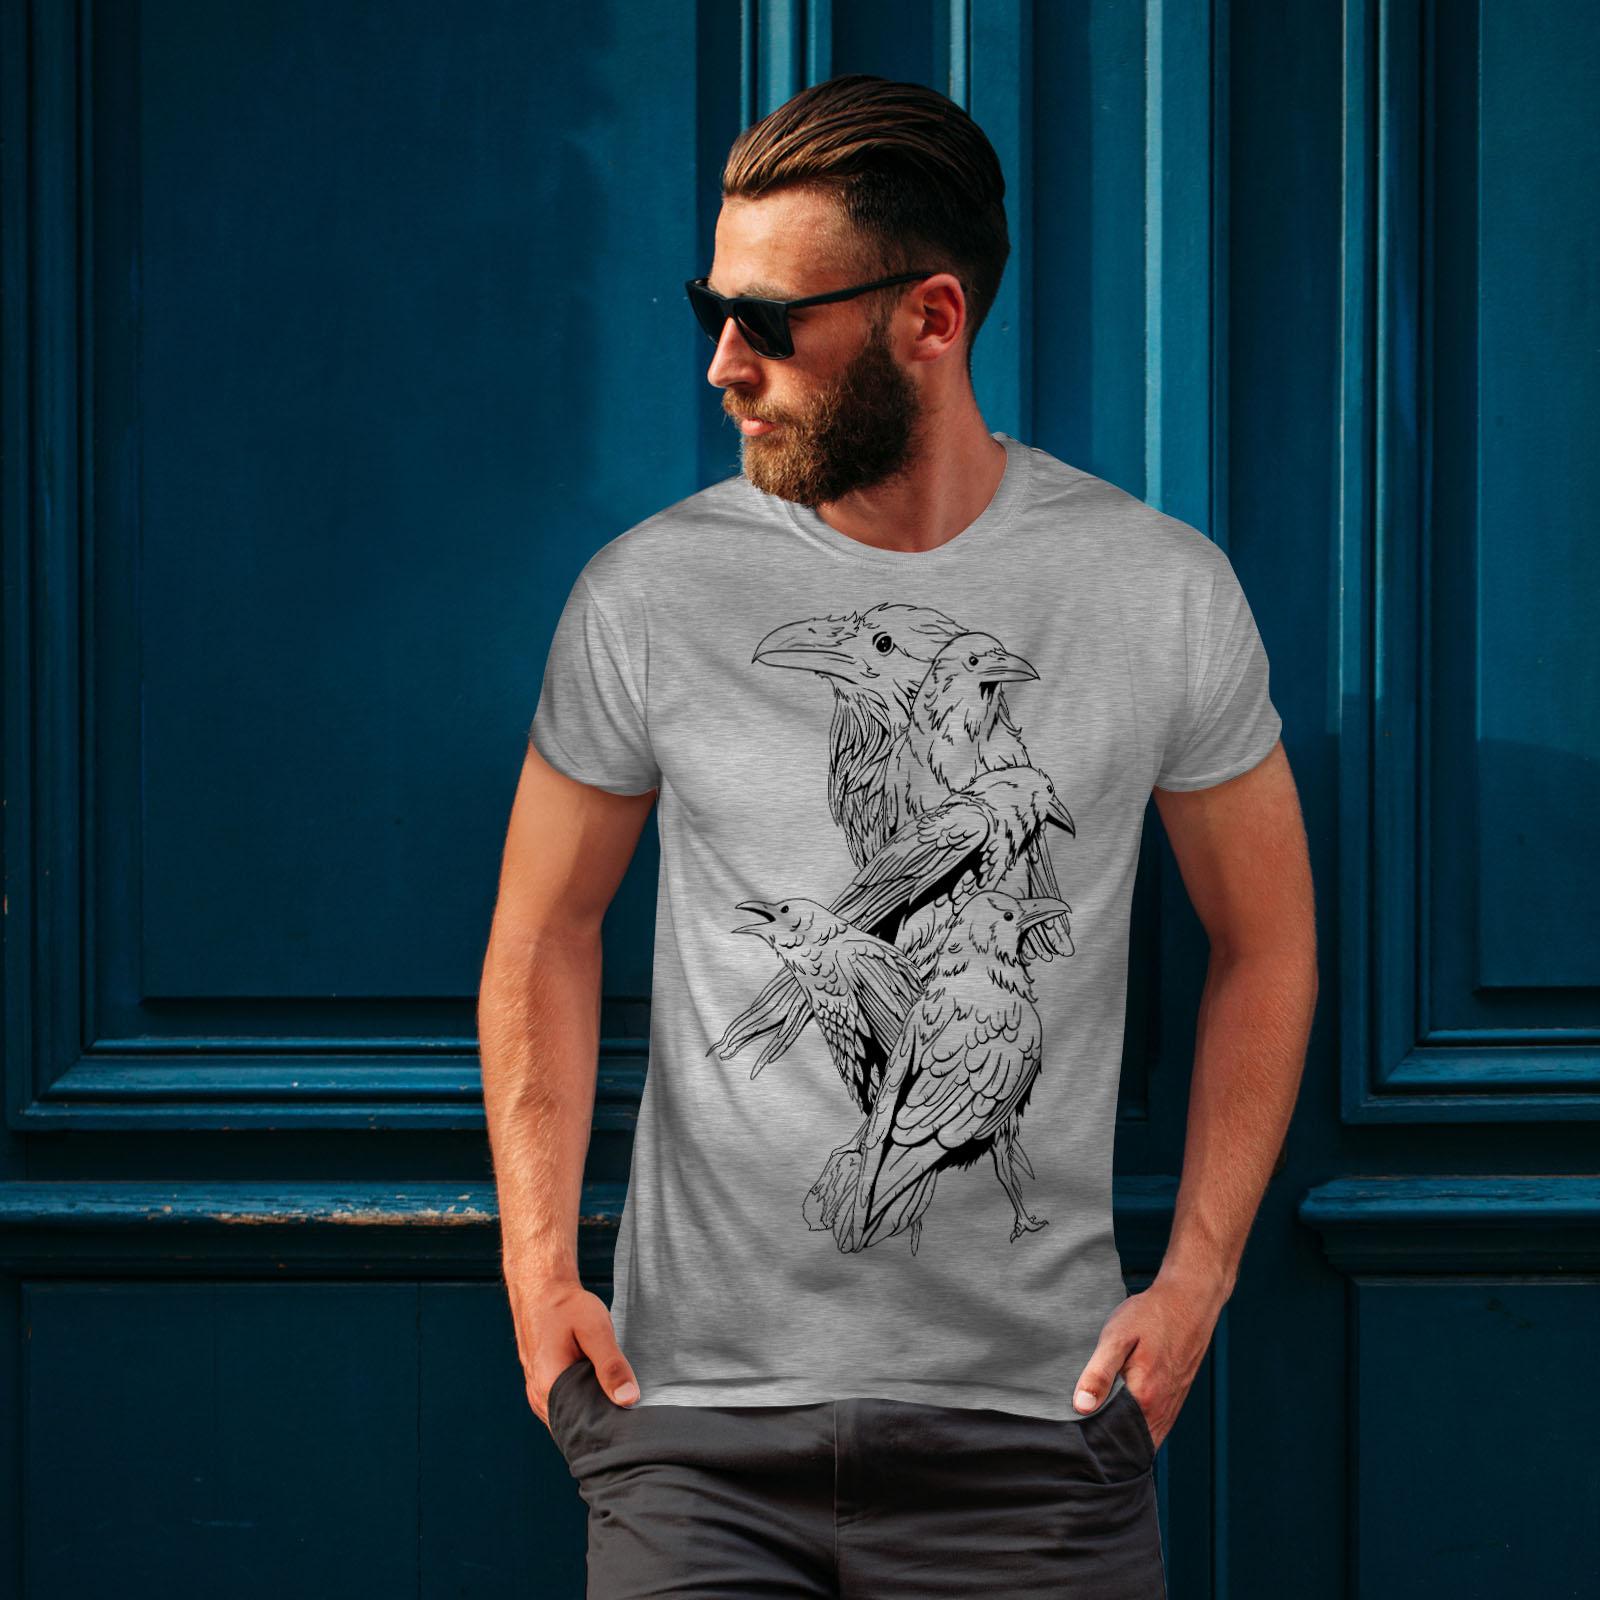 miniature 16 - Wellcoda Four Scary Raven Mens T-shirt, Crow Birds Graphic Design Printed Tee